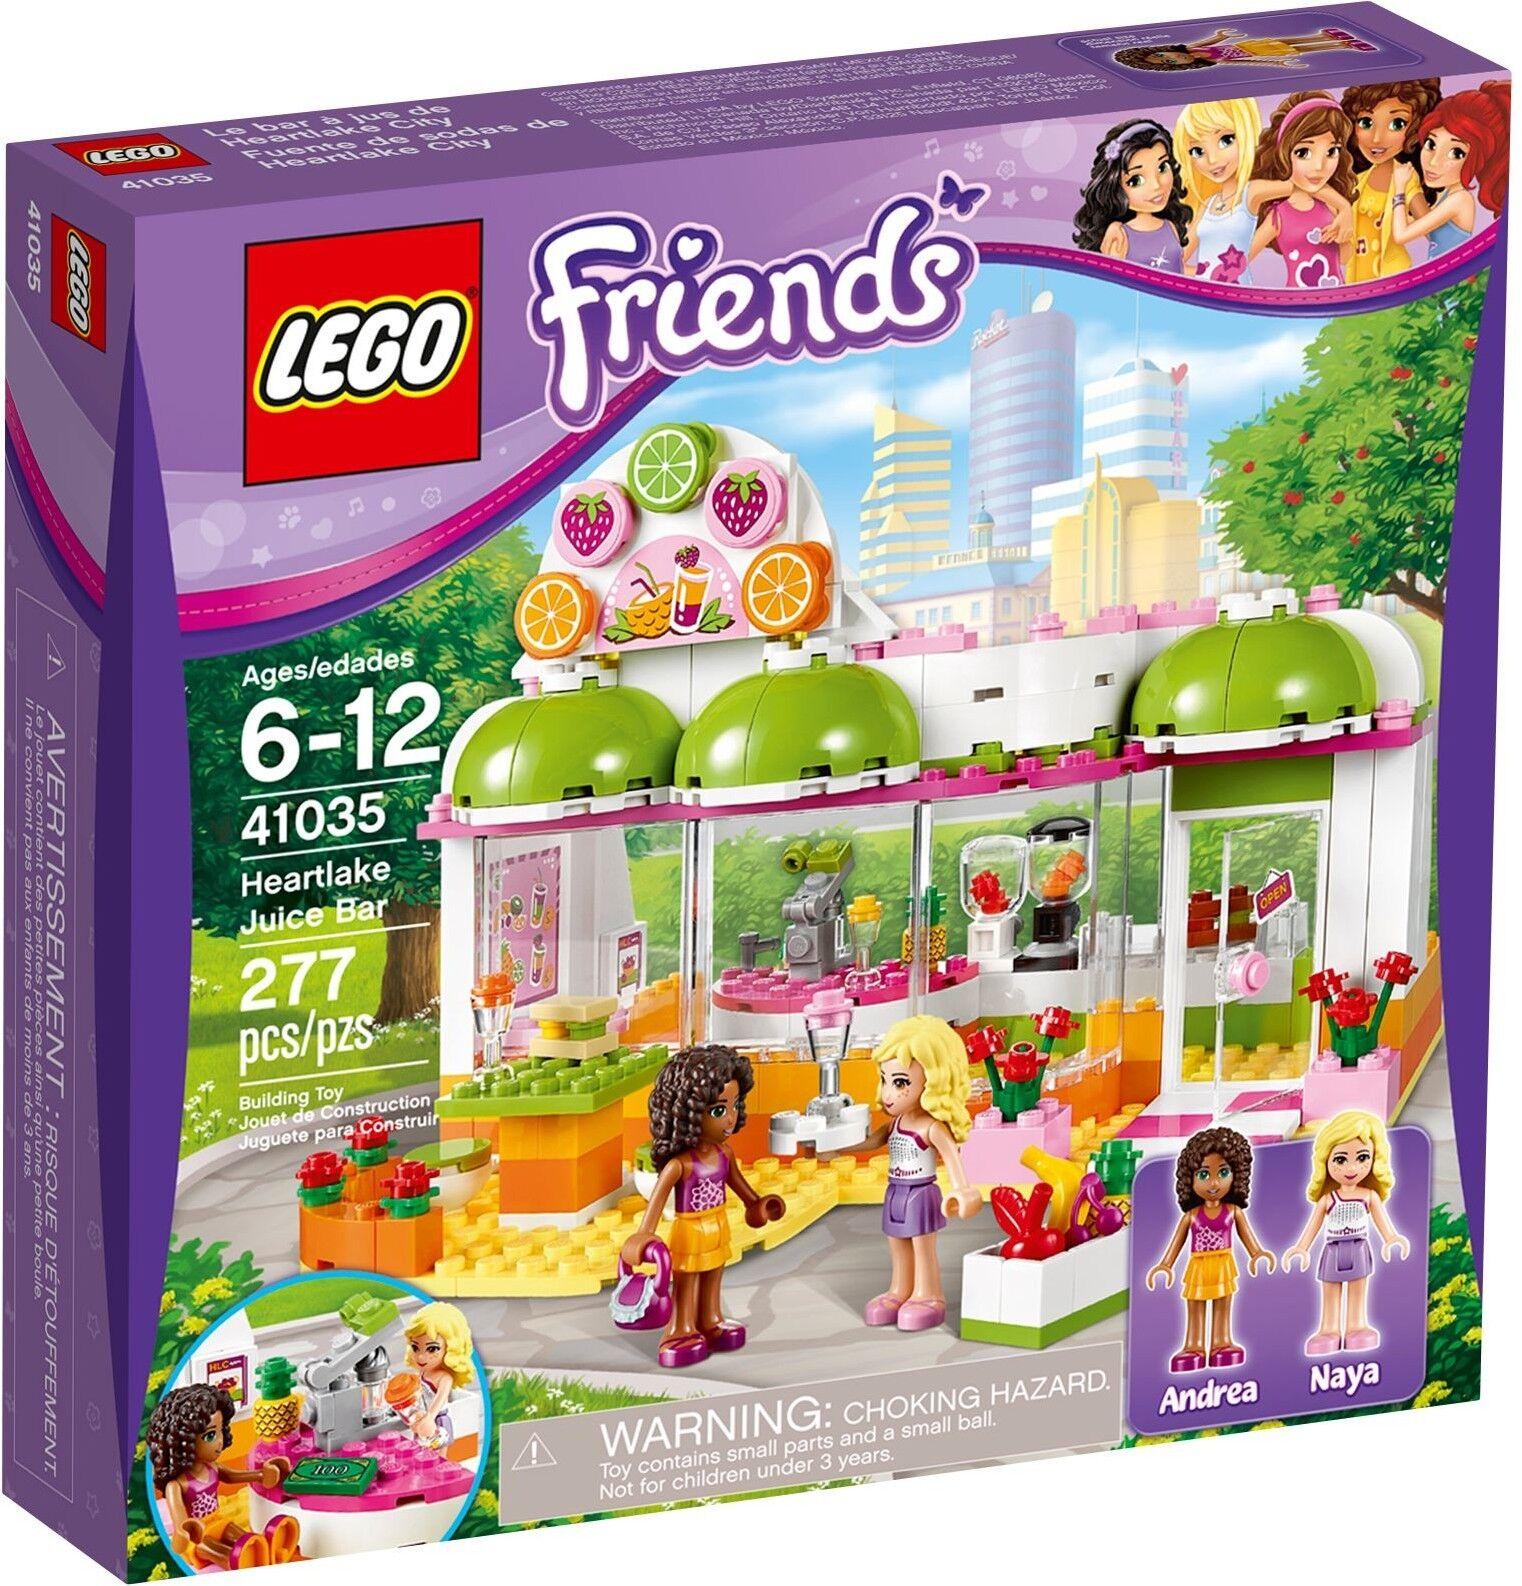 LEGO Friends 41035 Heartlake Juice Bar Andrea Naya BNIB shop store grocery